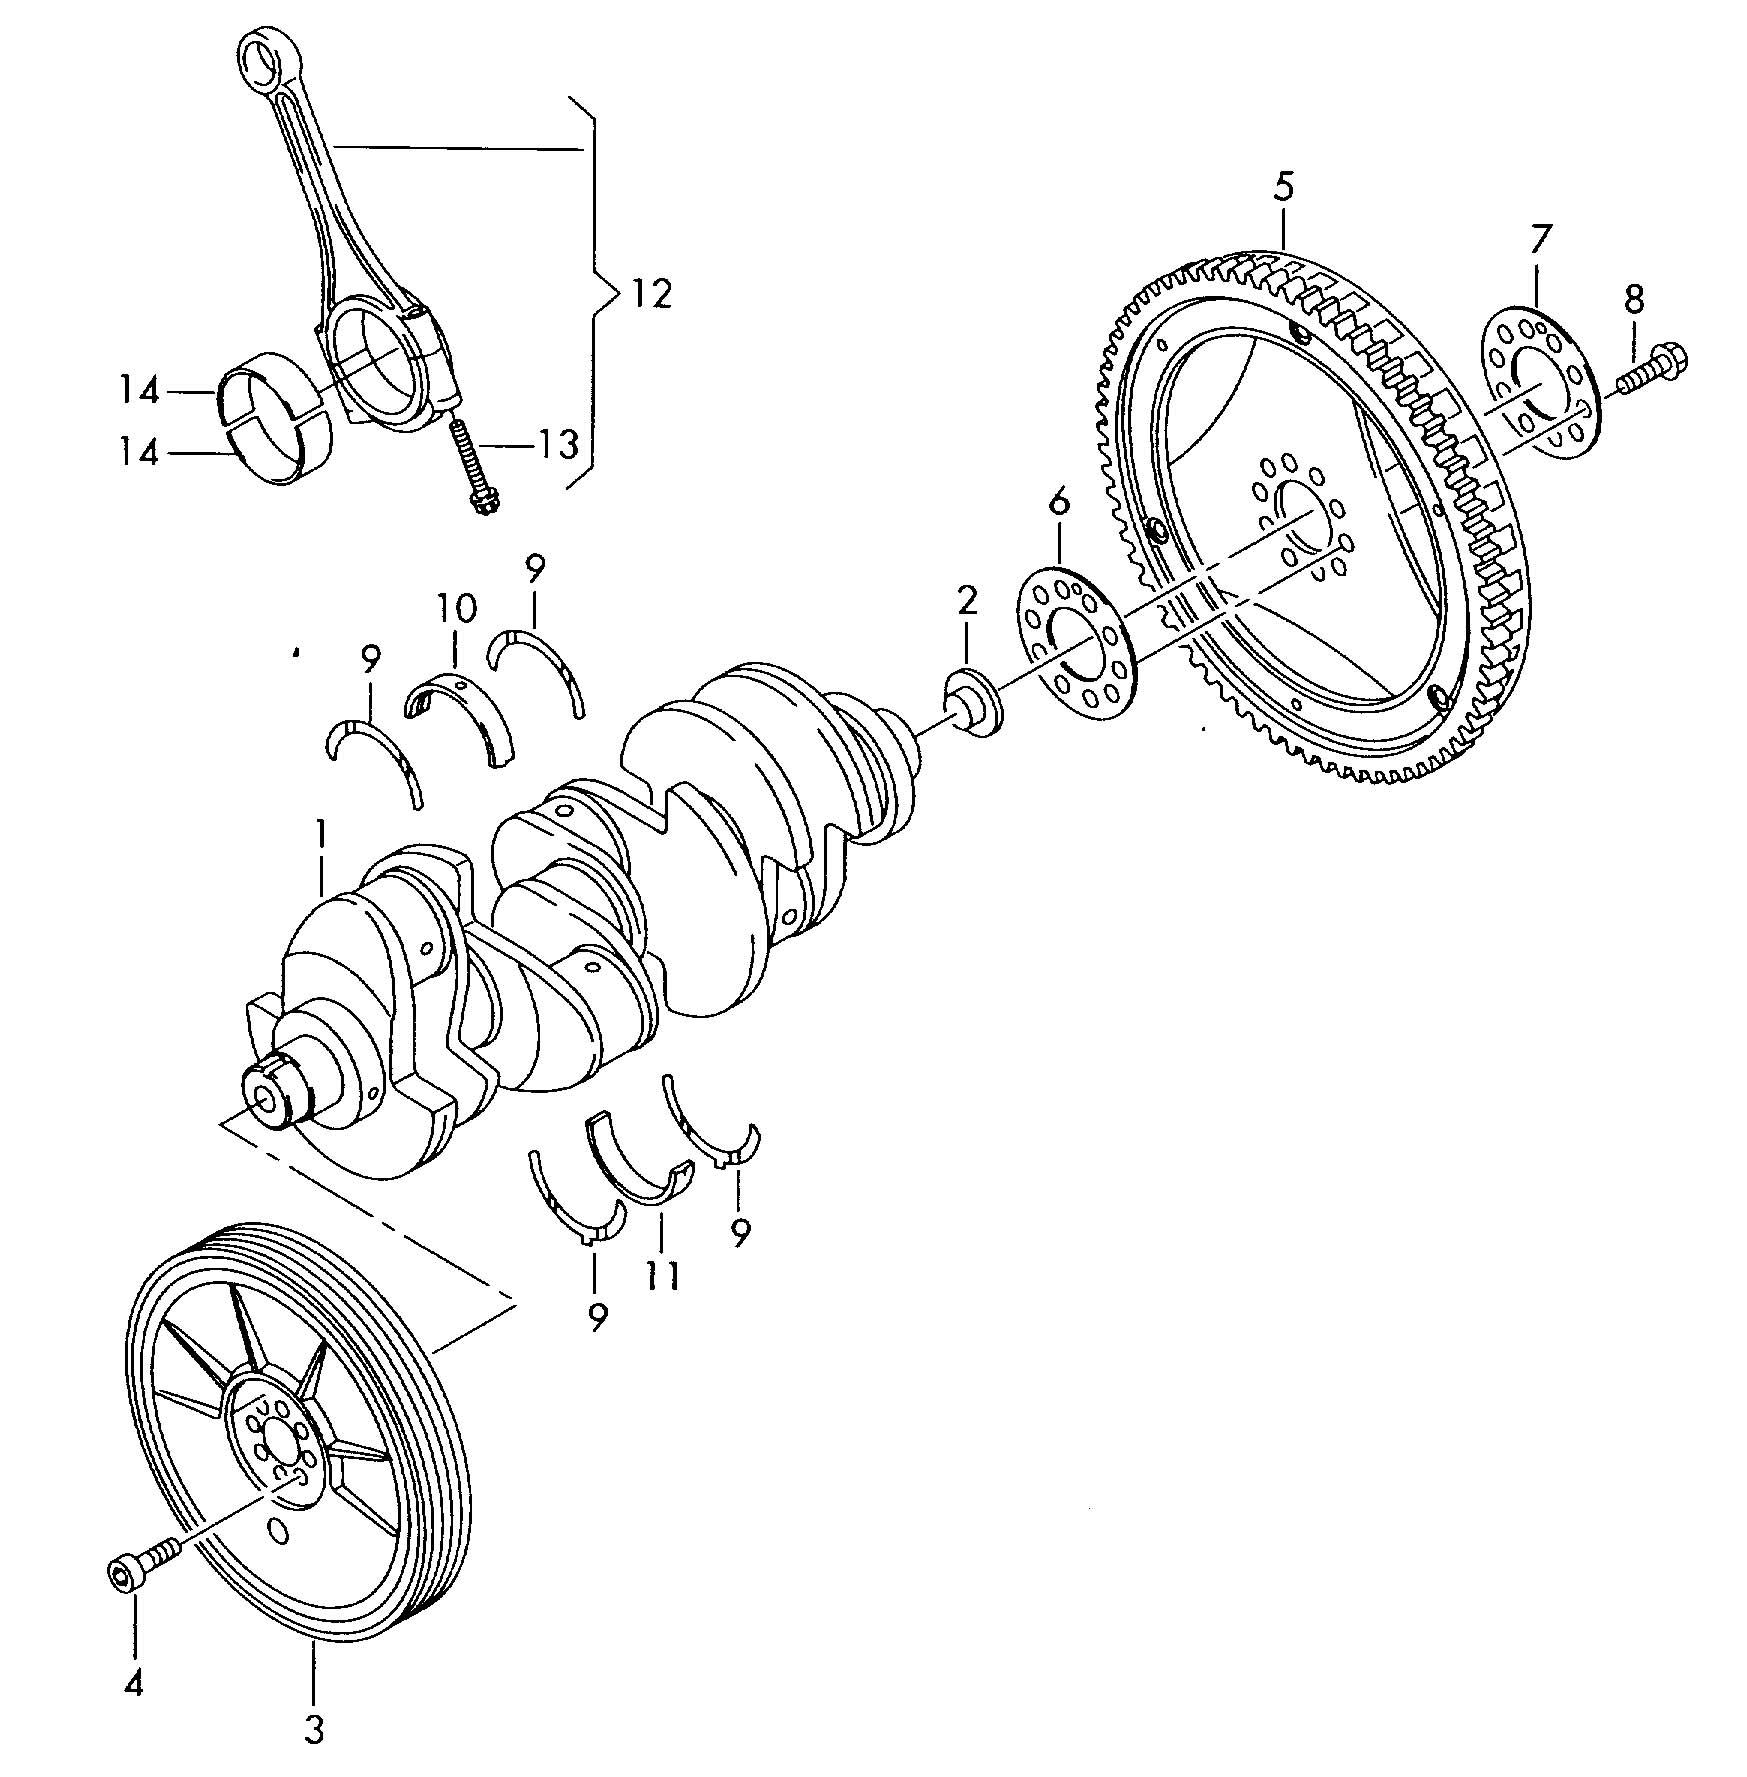 Vw Rabbit 1 8 Engine Diagram And Wiring 2002 Volkswagen Passat Parts In Addition Golf Mk3 Fuse Box Further Harness